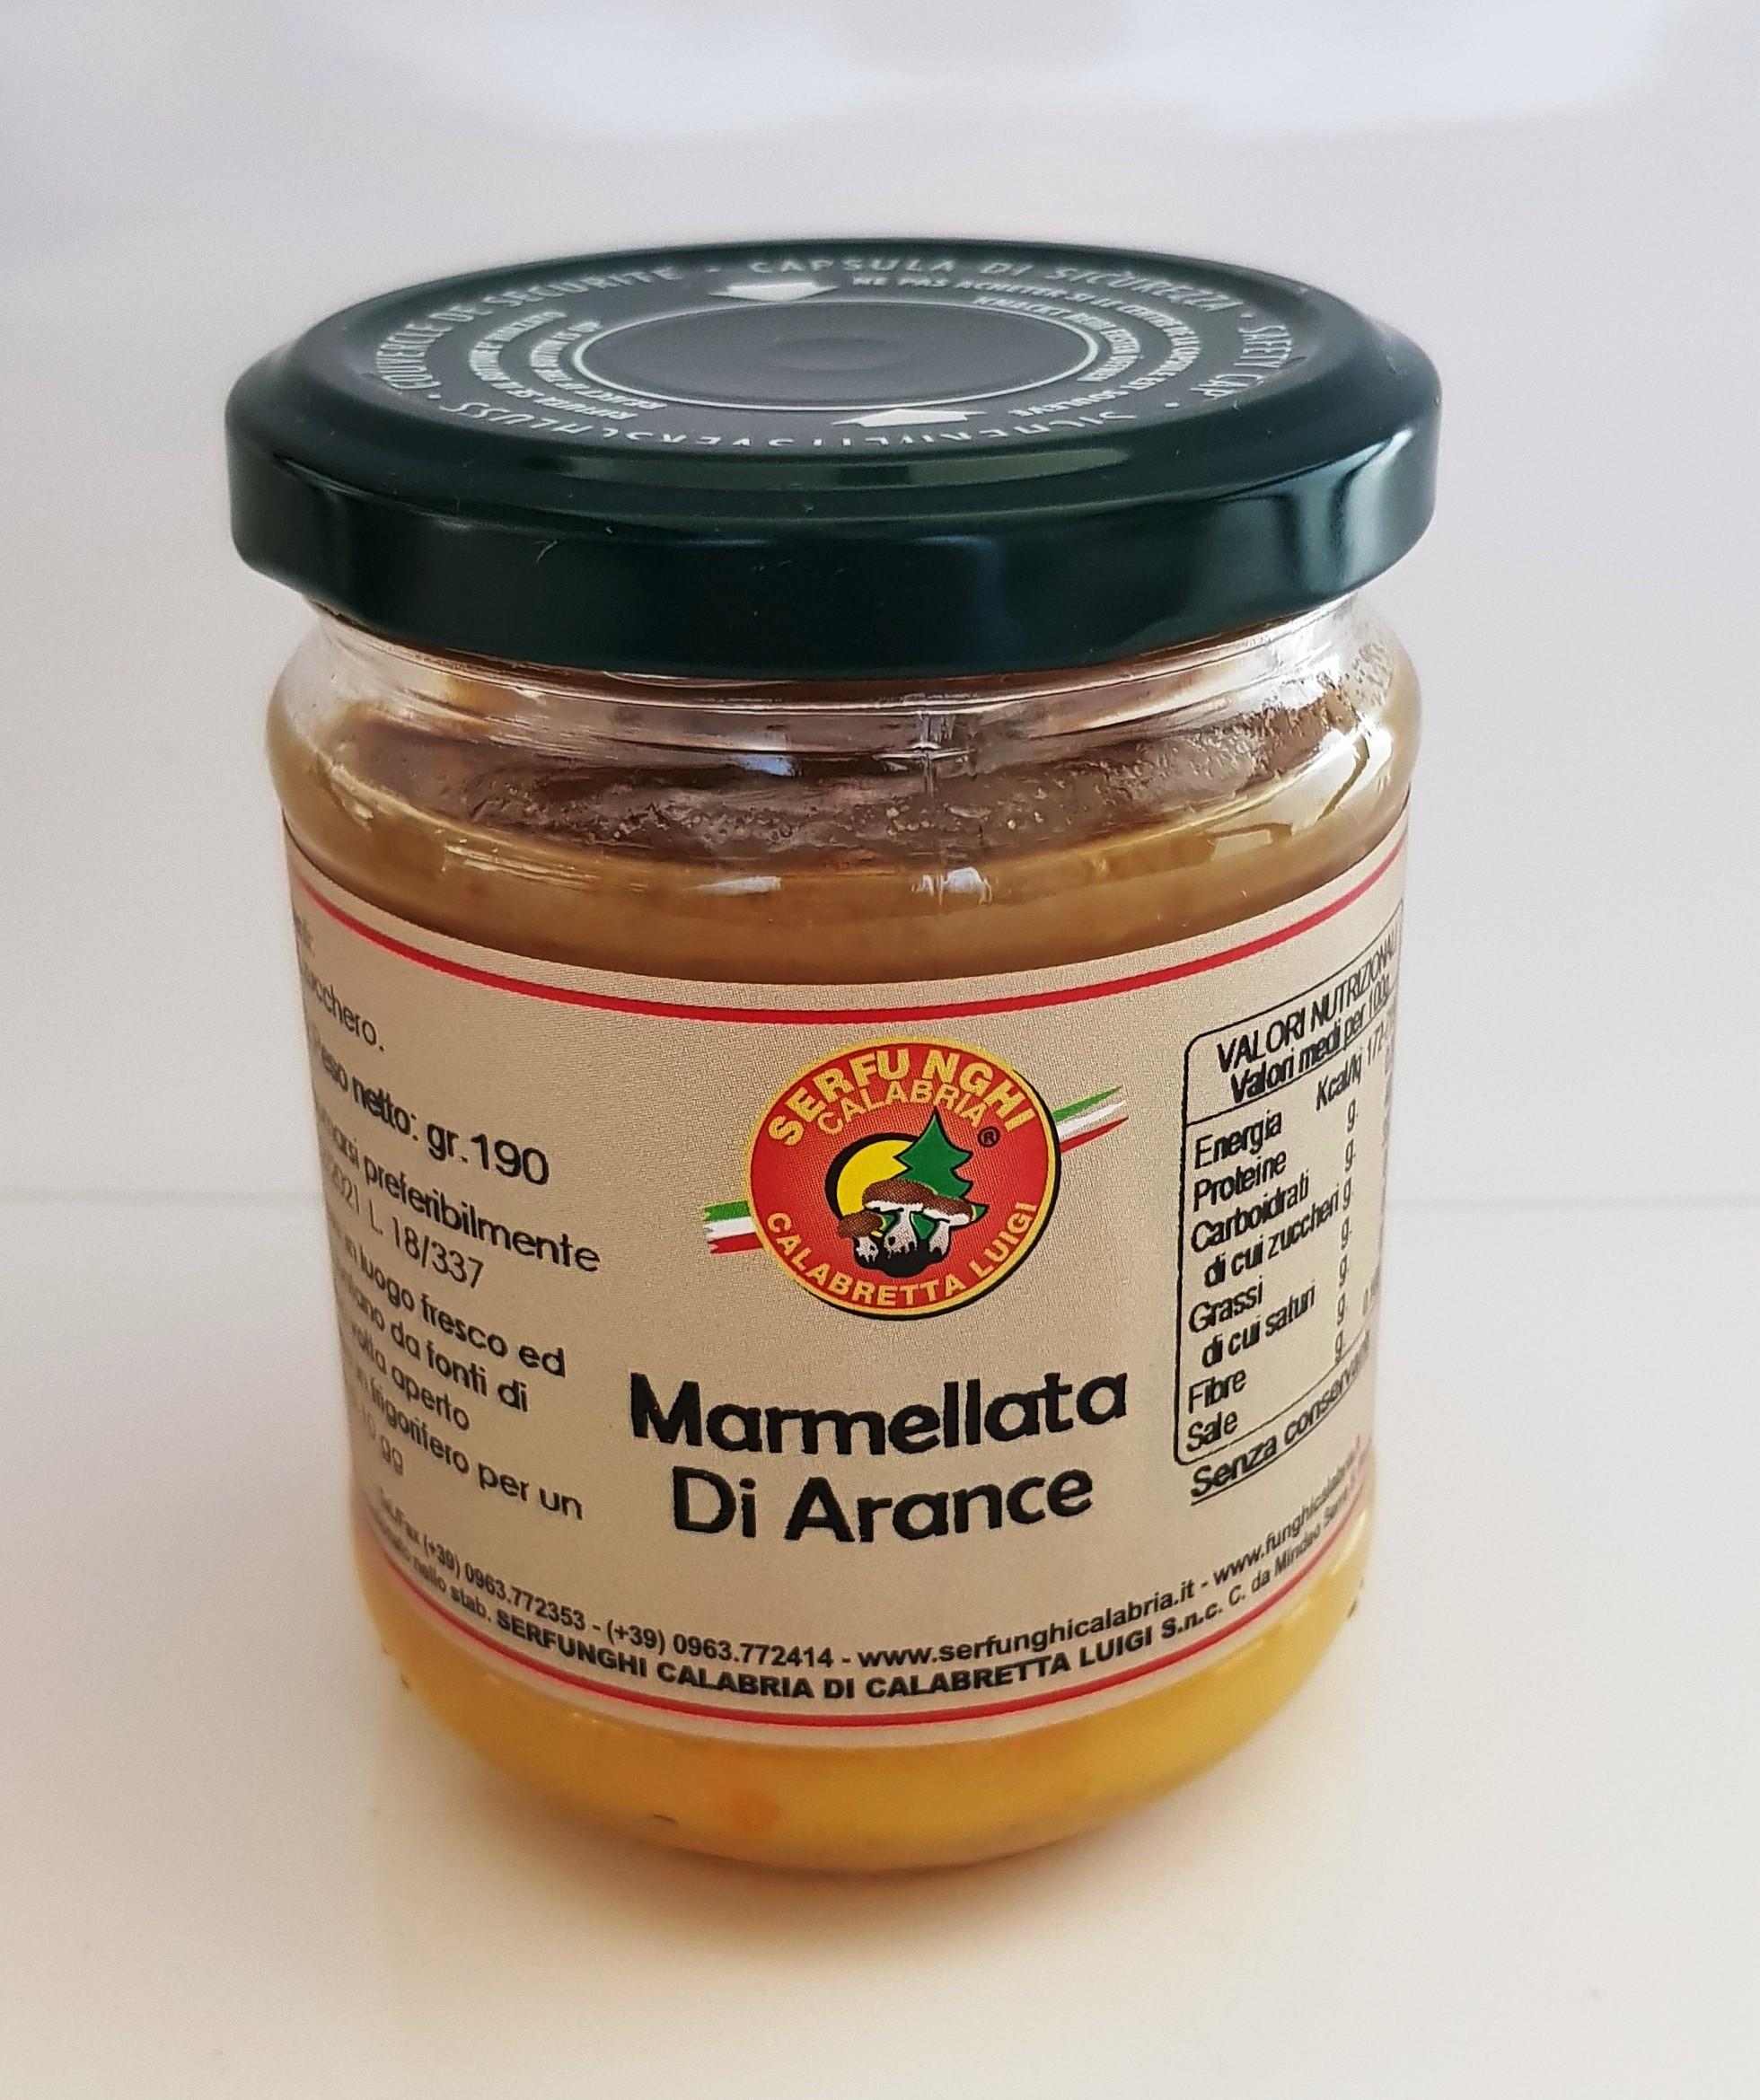 MARMELLATA DI ARANCE ML 212